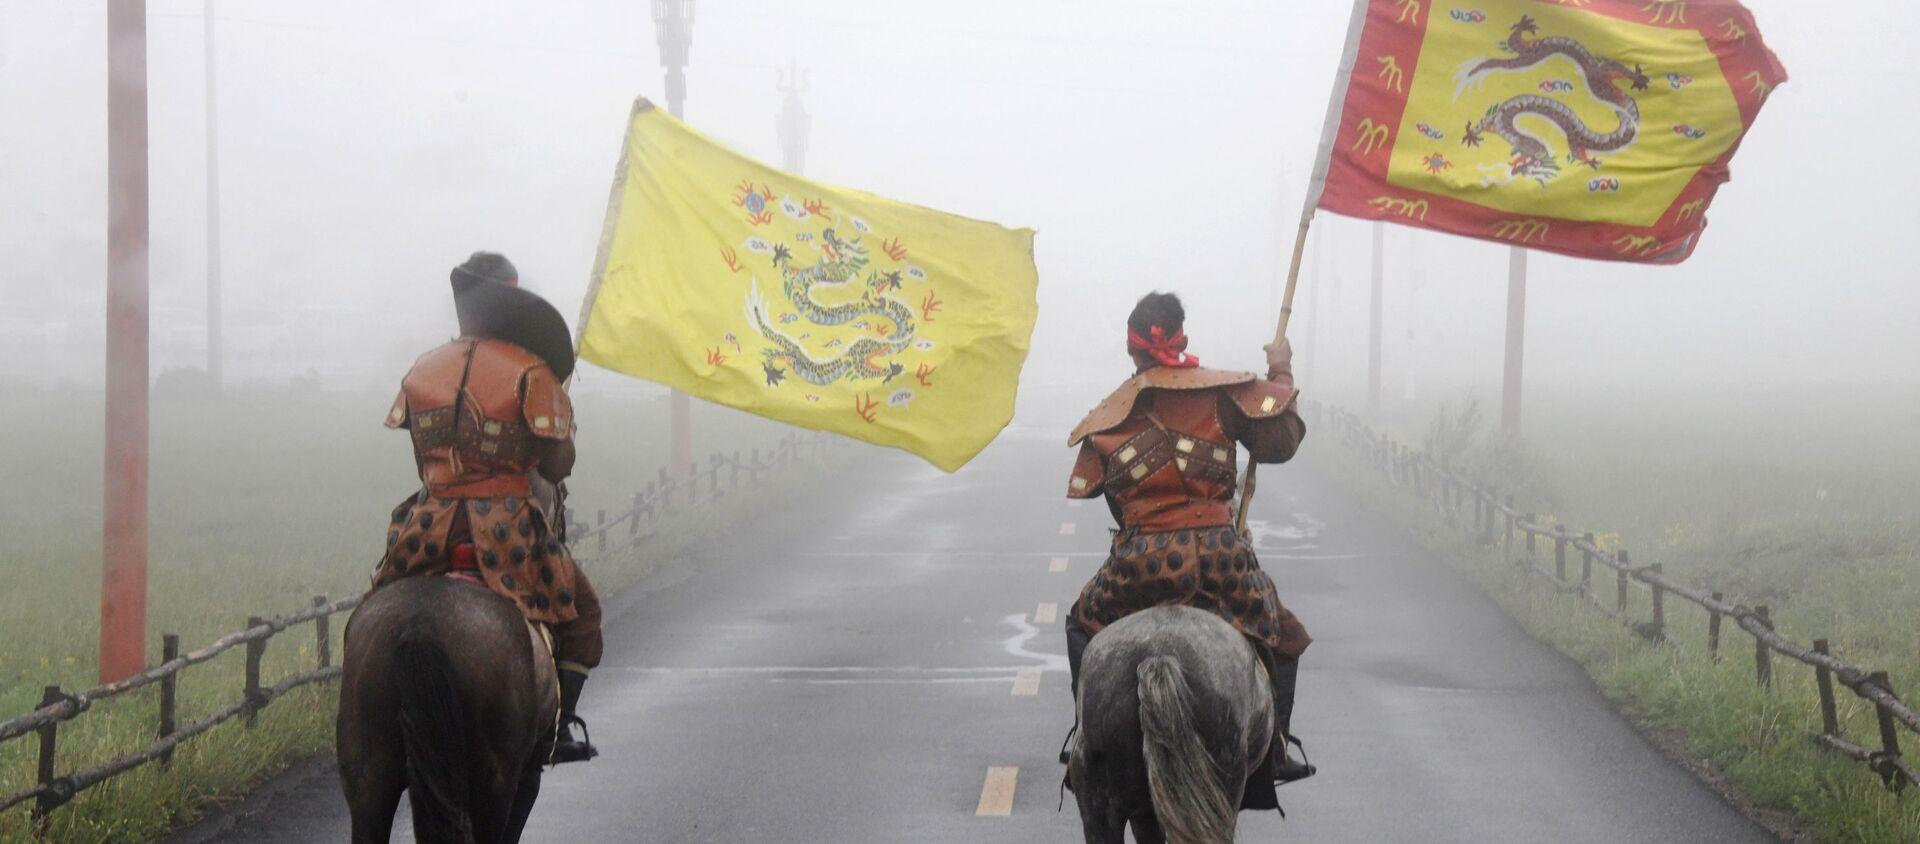 Cavalieri mongoli in Cina - Sputnik Italia, 1920, 30.11.2020